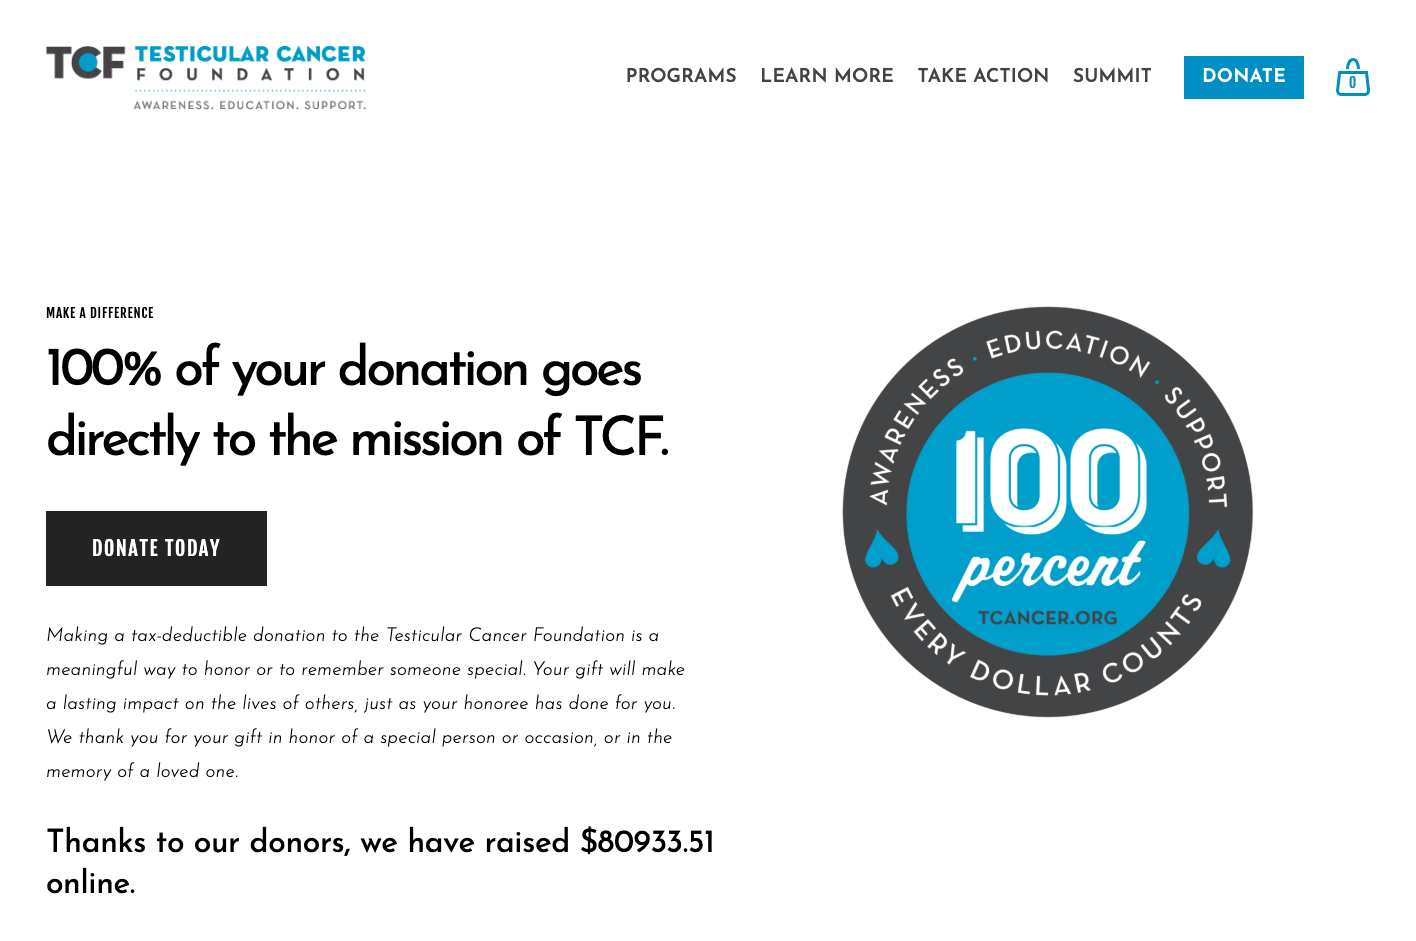 TCF-donation-page-raise-more-through-website